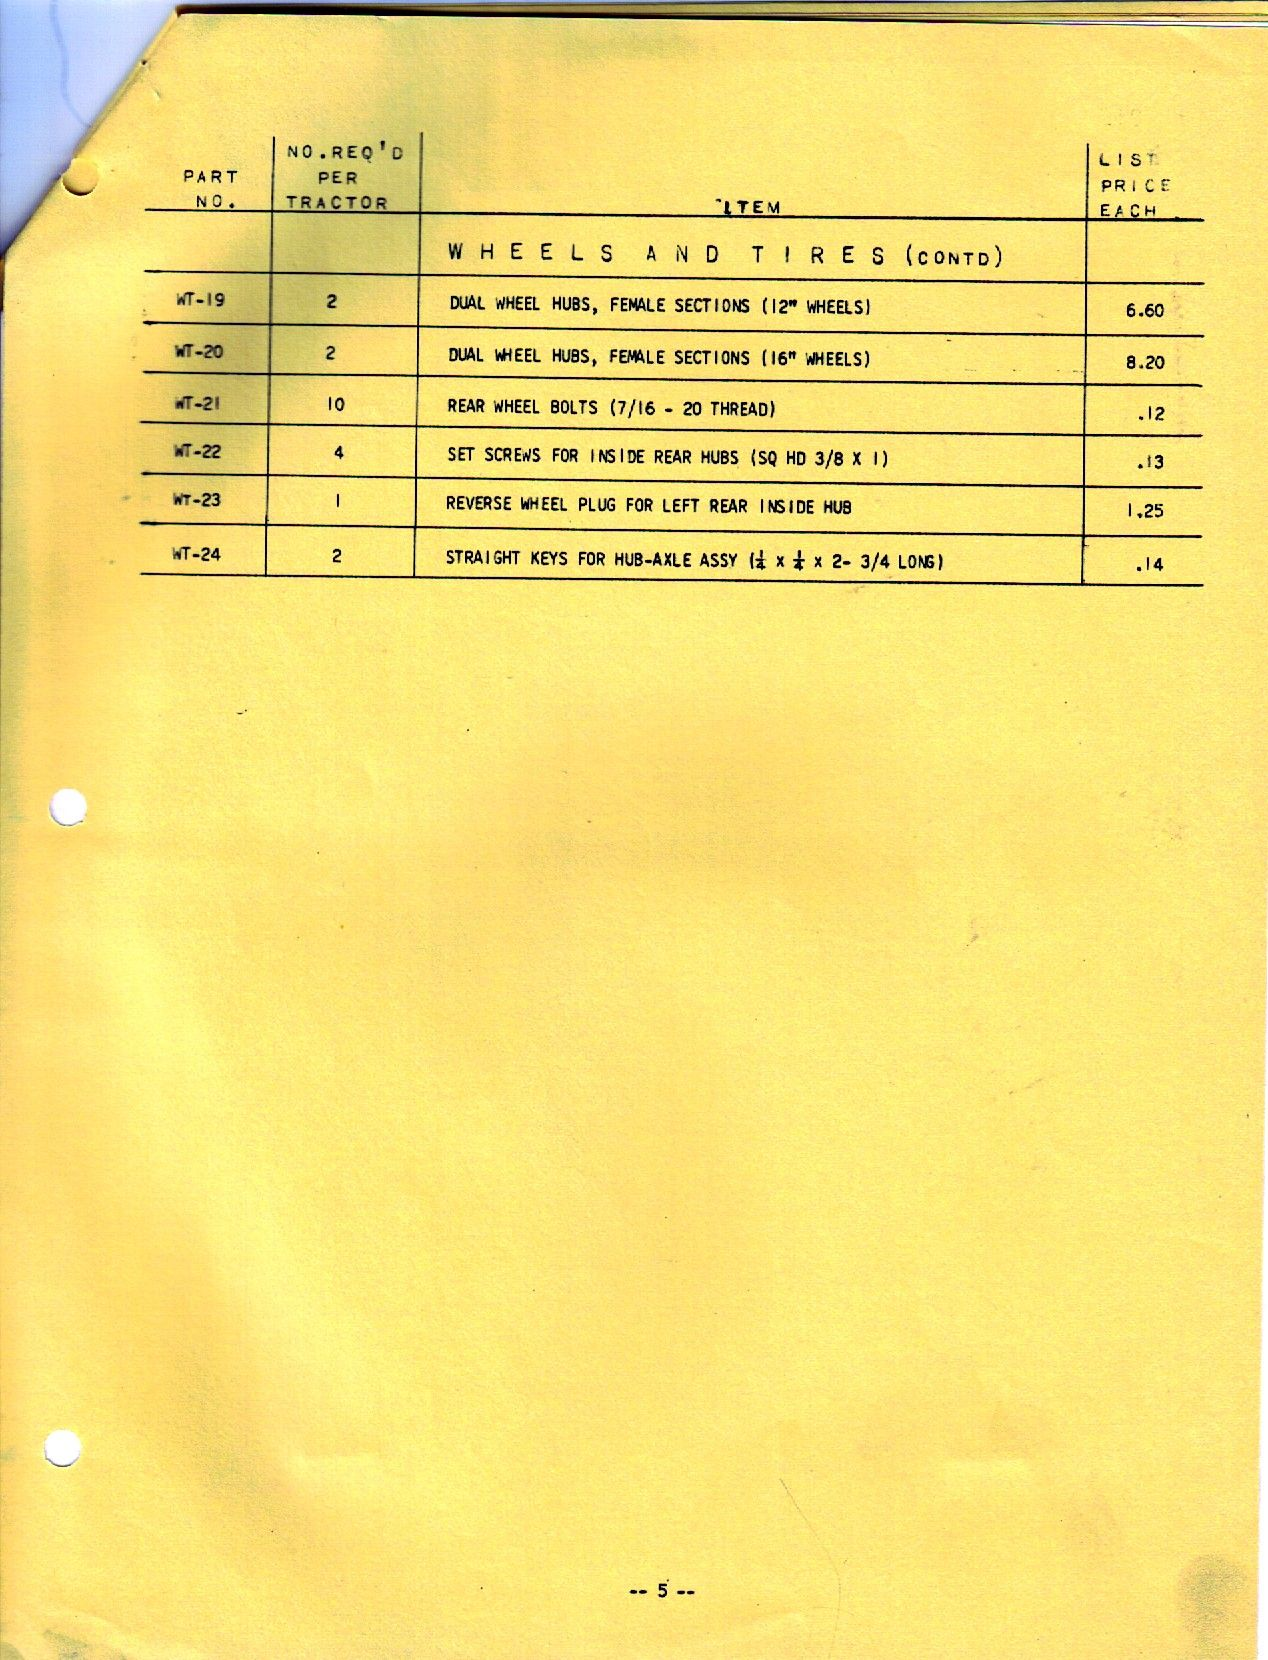 883 Manual 19972000 Honda Crv Electrical Troubleshooting Original Array Tiger Parts Page 5 Garden Tractor Literature Rh Pinterest Com